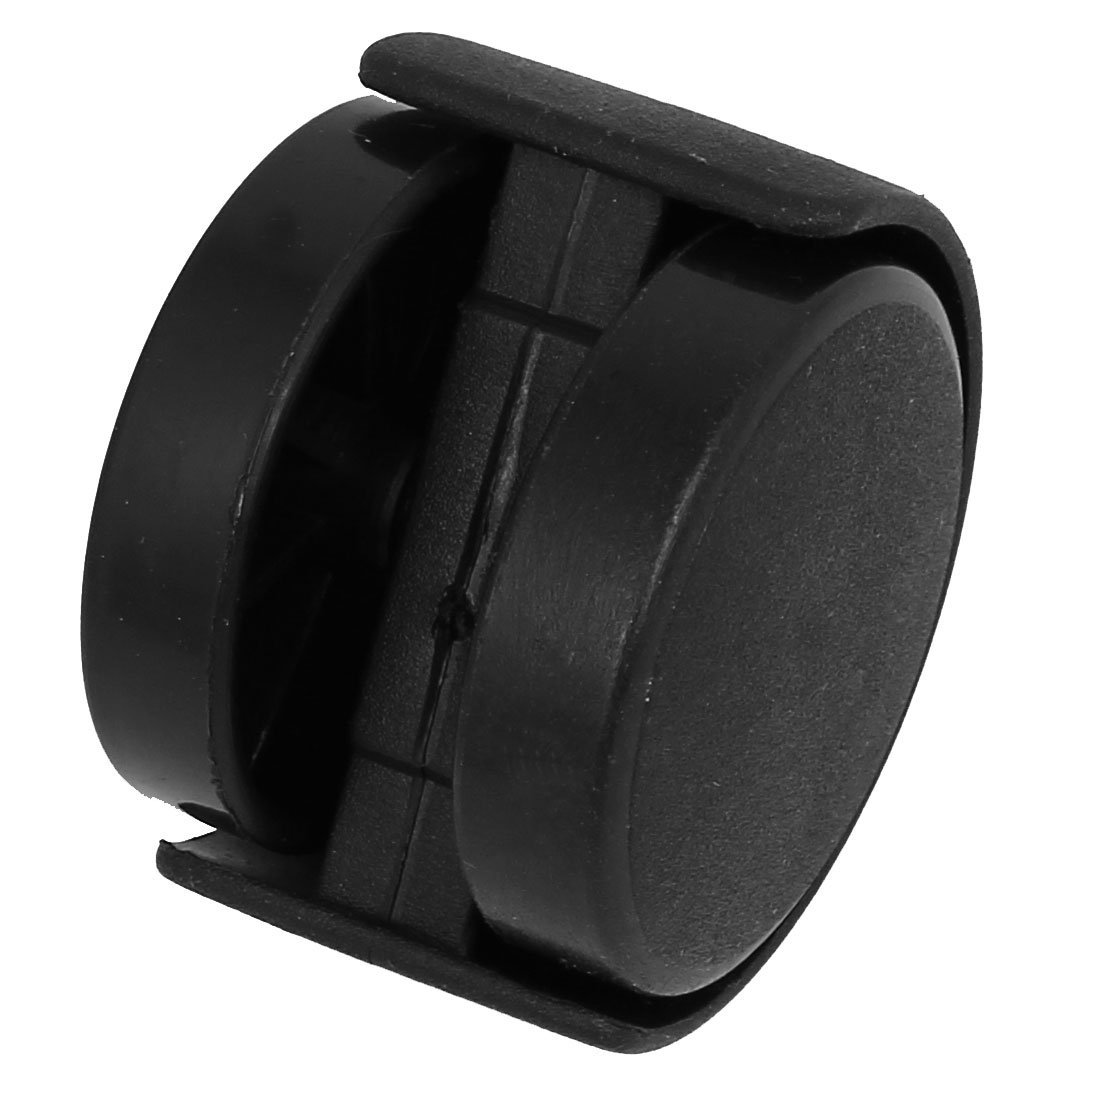 eDealMax 1, 5 pulgadas de Doble diámetro de la rueda de tornillo rotativo montado en Rueda giratoria: Amazon.com: Industrial & Scientific